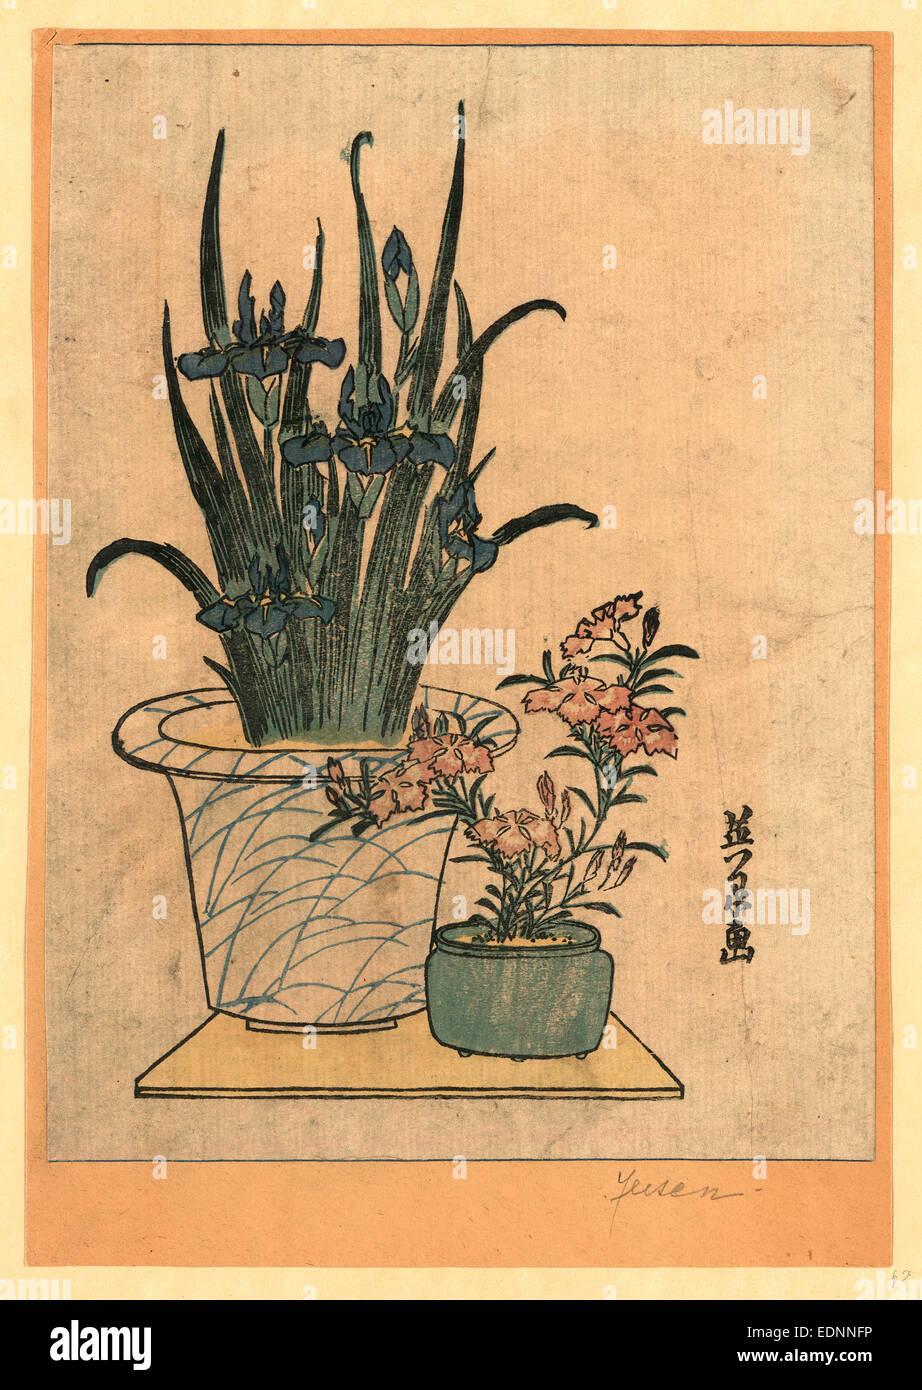 Hanashobu ni nadeshiko, Potted irises and pinks., Ikeda, Eisen, 1790-1848, artist, [between 1818 and 1844], 1 print - Stock Image